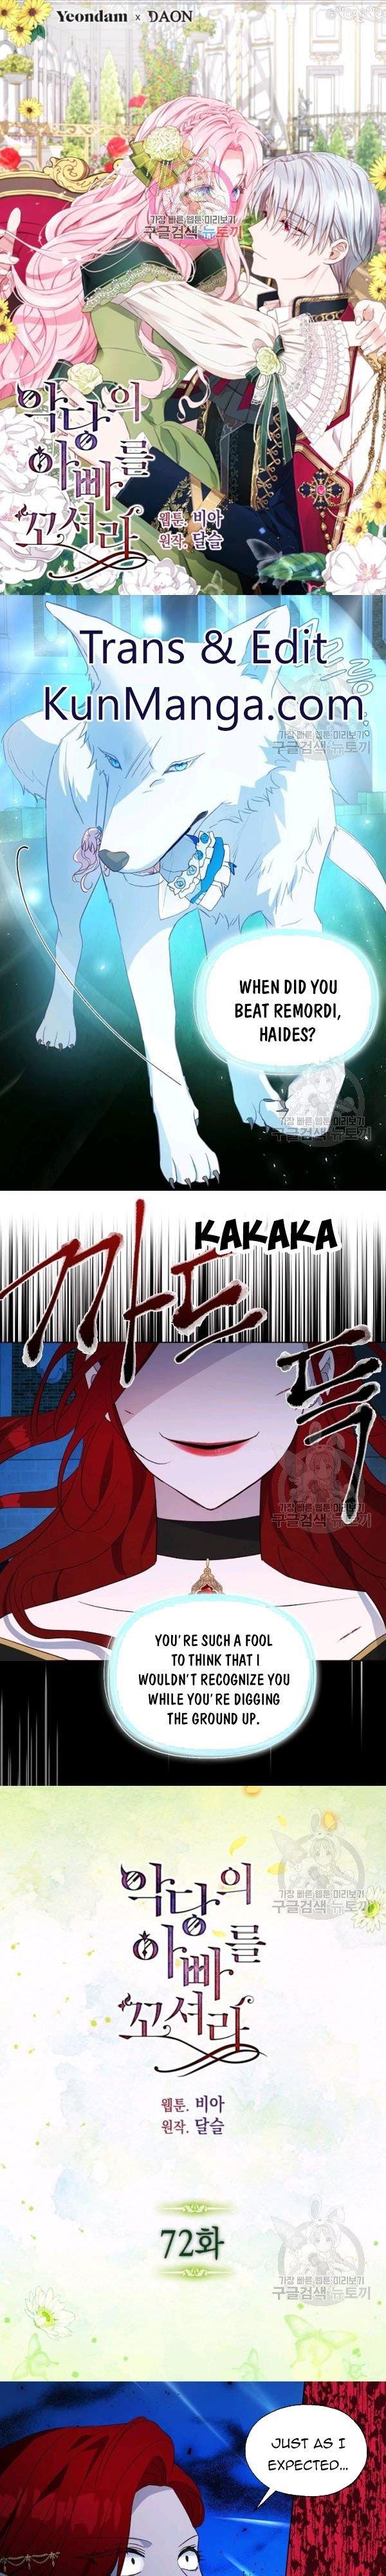 Manga Seduce The Villain's Father - Chapter 72 Page 1